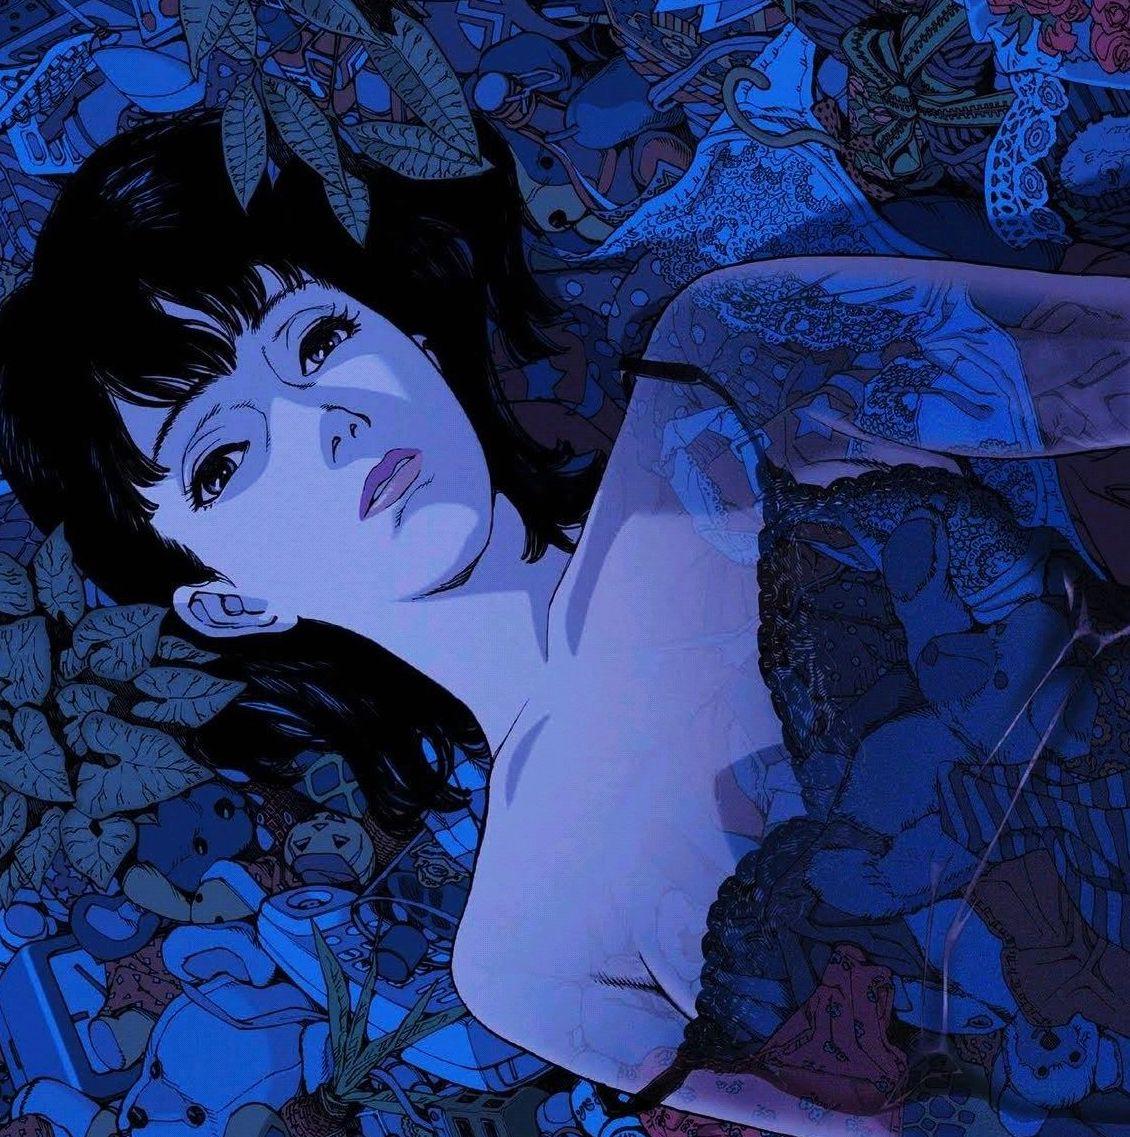 Perfect Blue: Psikolojik Bir Gerilim - Pera Sinema